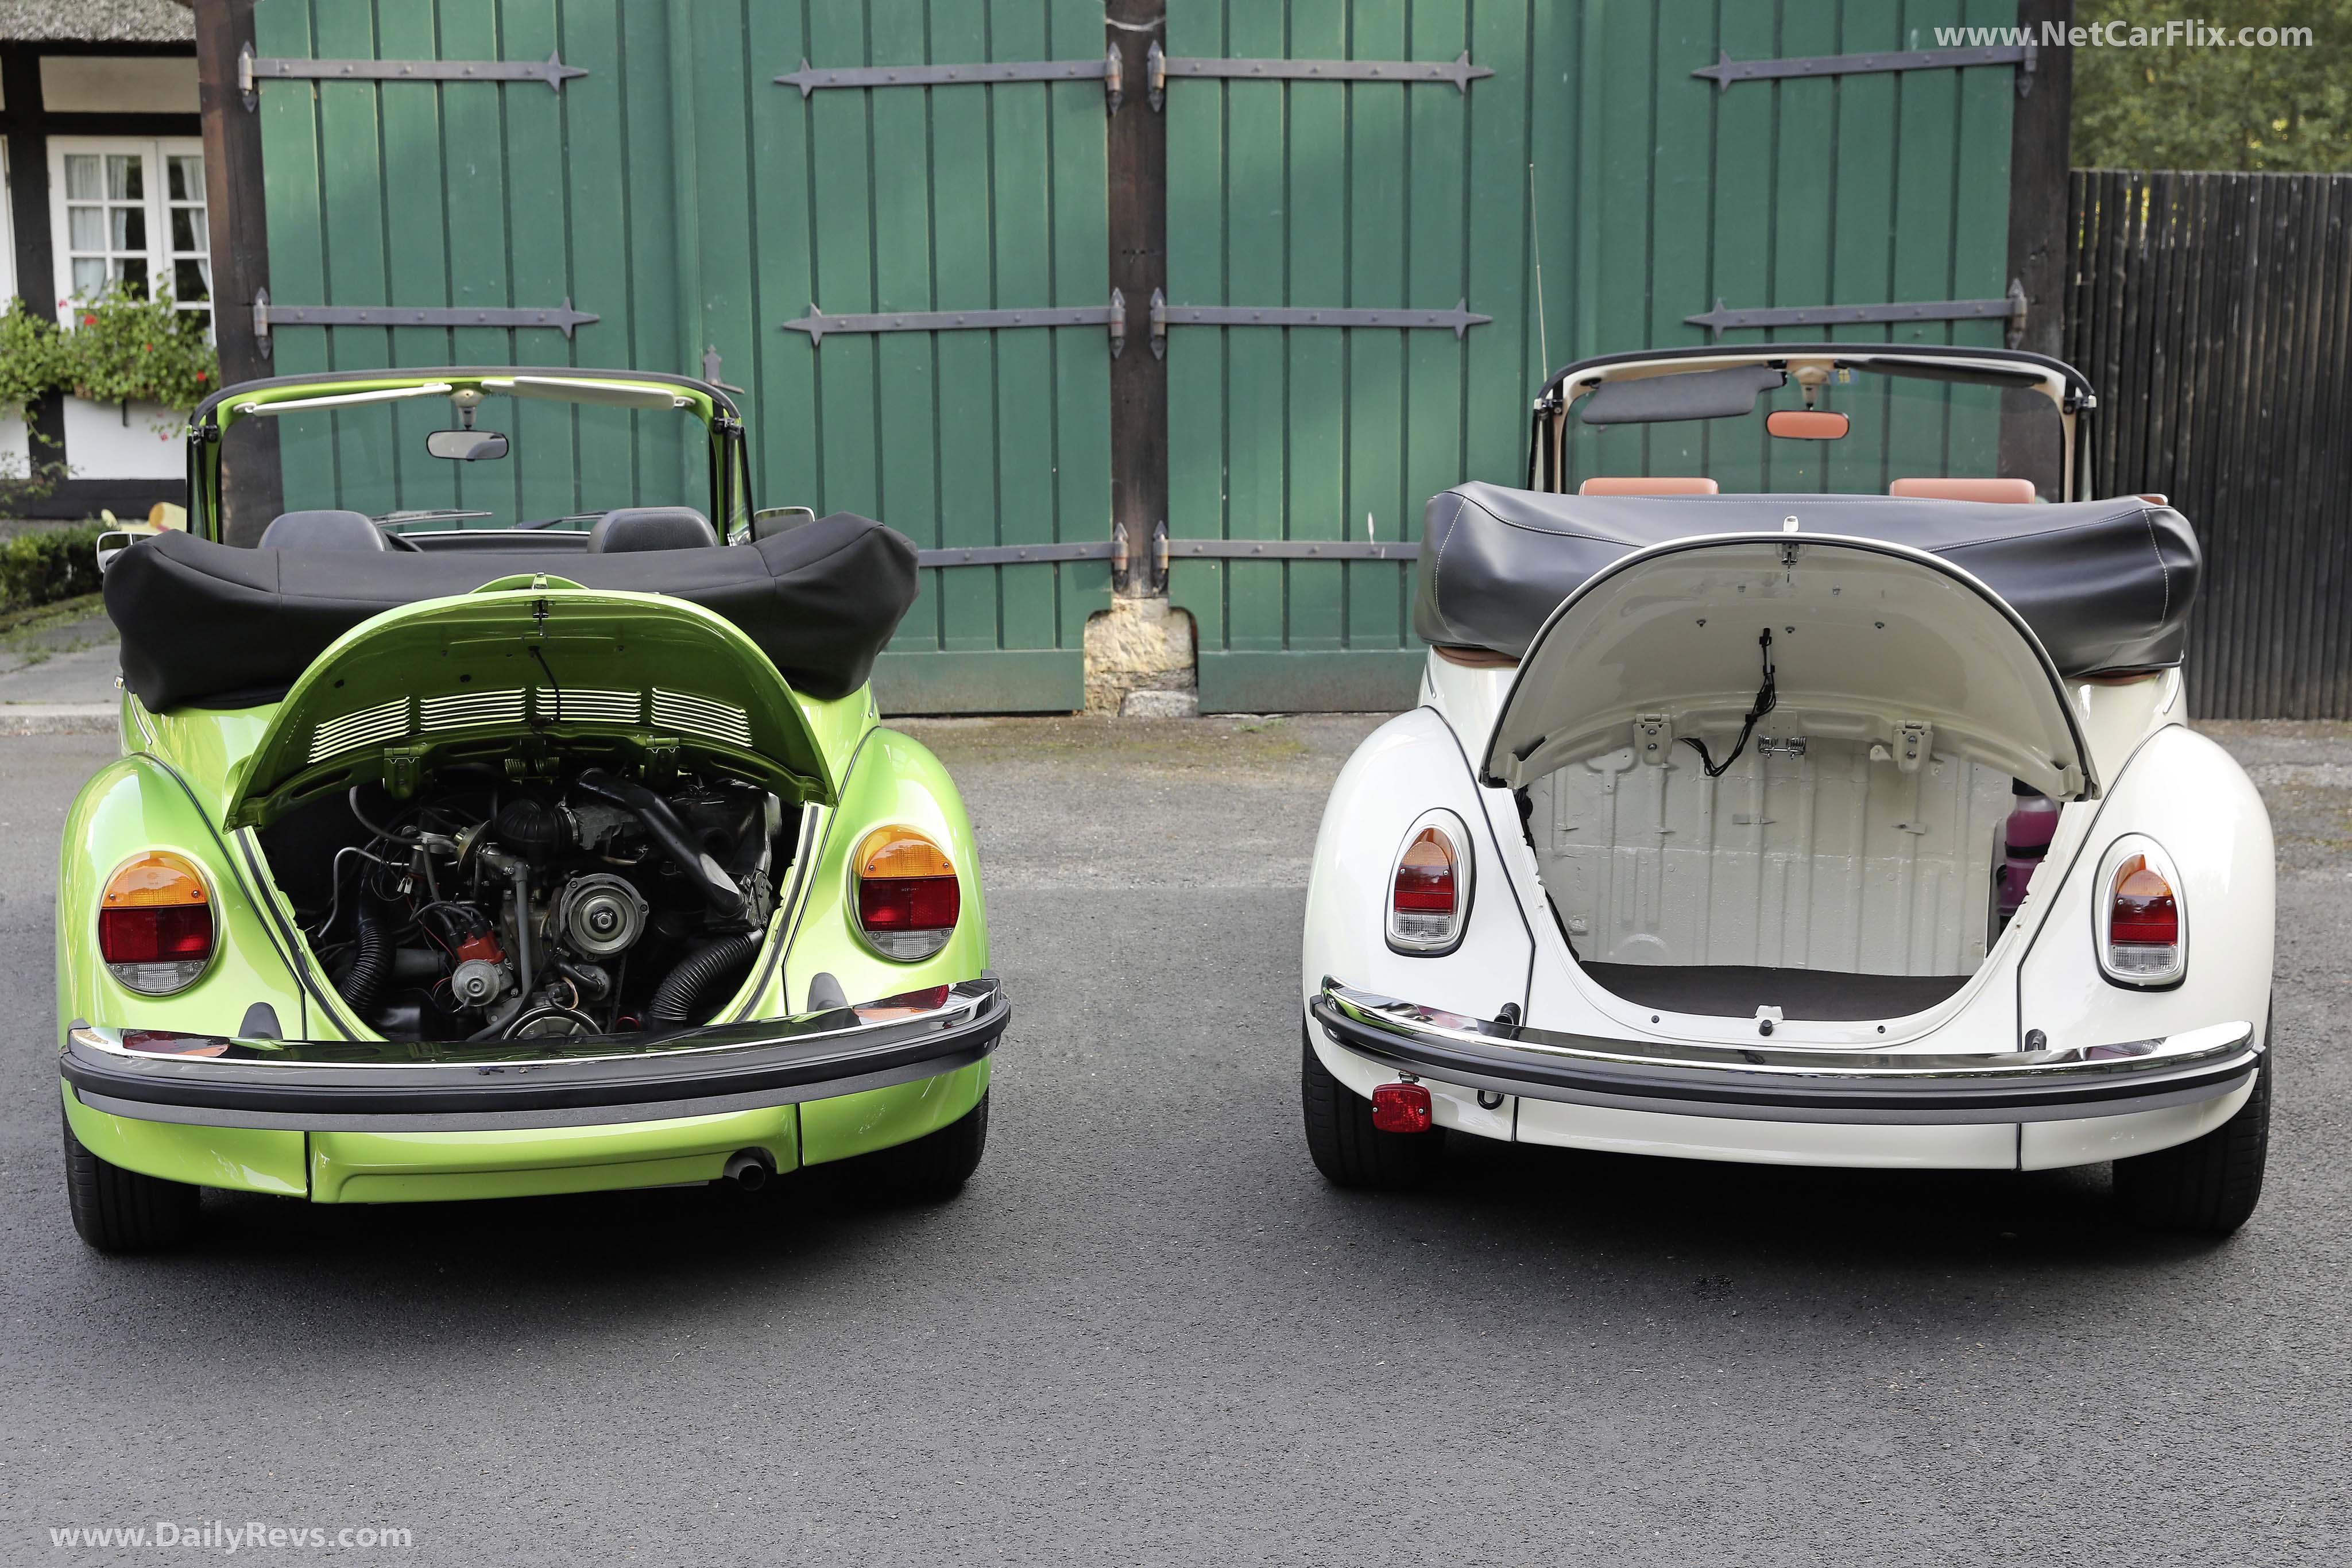 Vw Specialist Near Me >> 2020 Volkswagen e-Beetle Concept -HQ Pictures, Specs ...